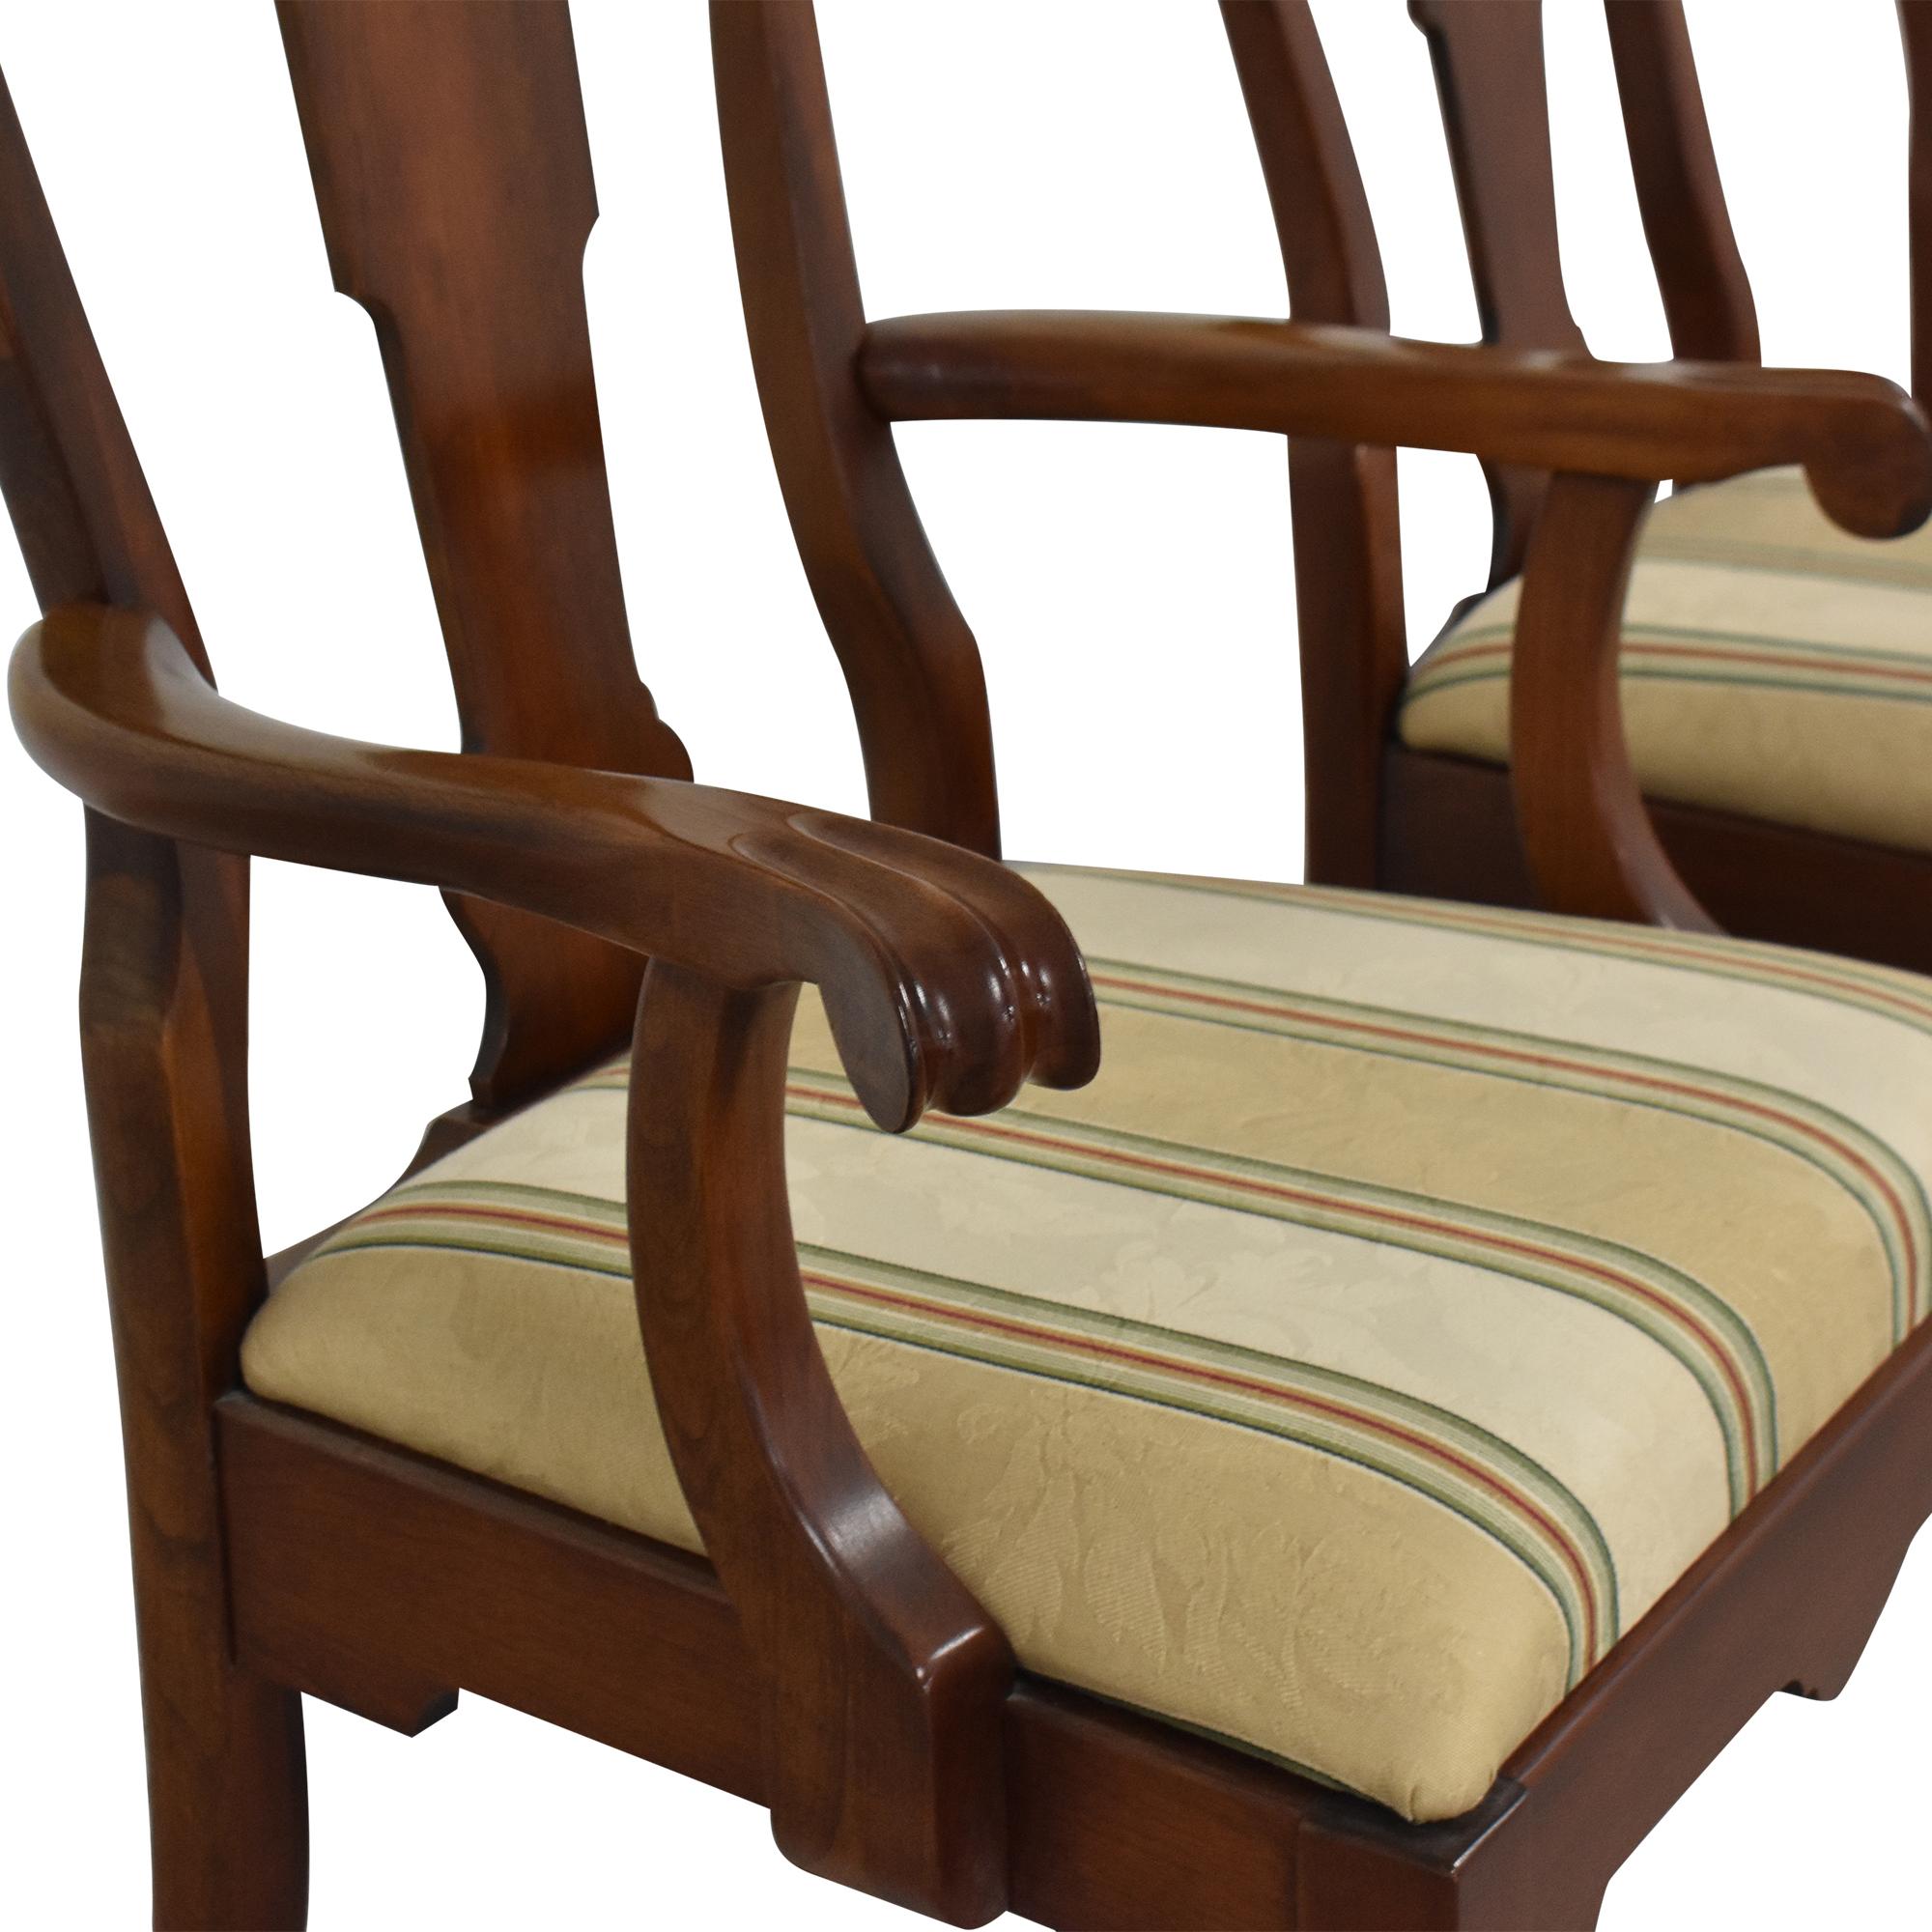 buy Pennsylvania House Stripe Dining Chairs Pennsylvania House